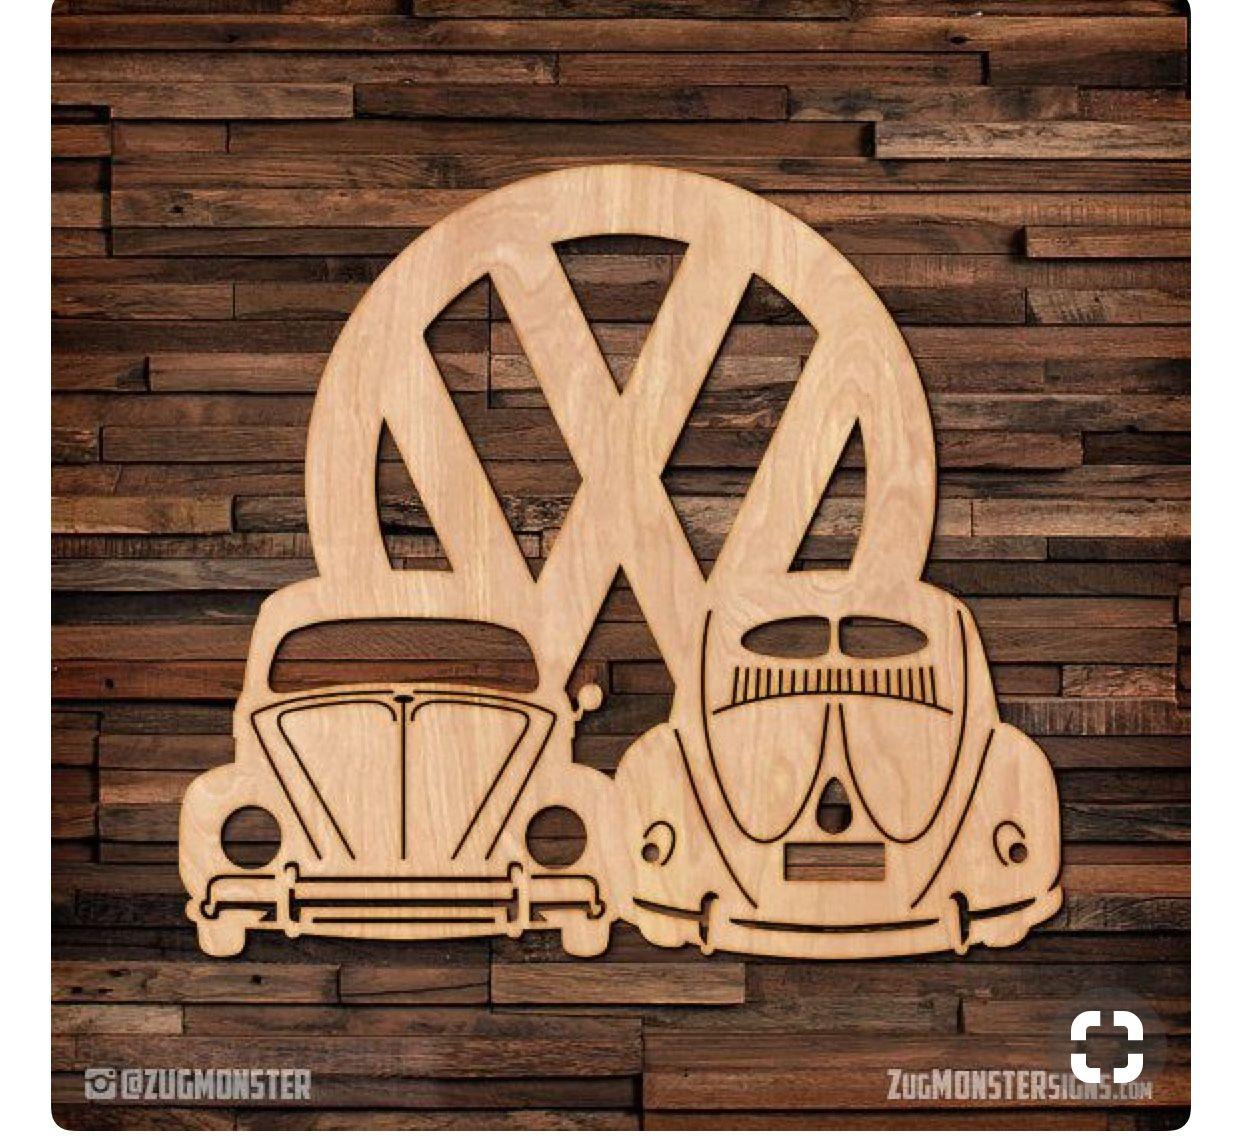 160 Holzautos Ideen In 2021 Holzspielzeug Spielzeug Holzspielzeug Lkw